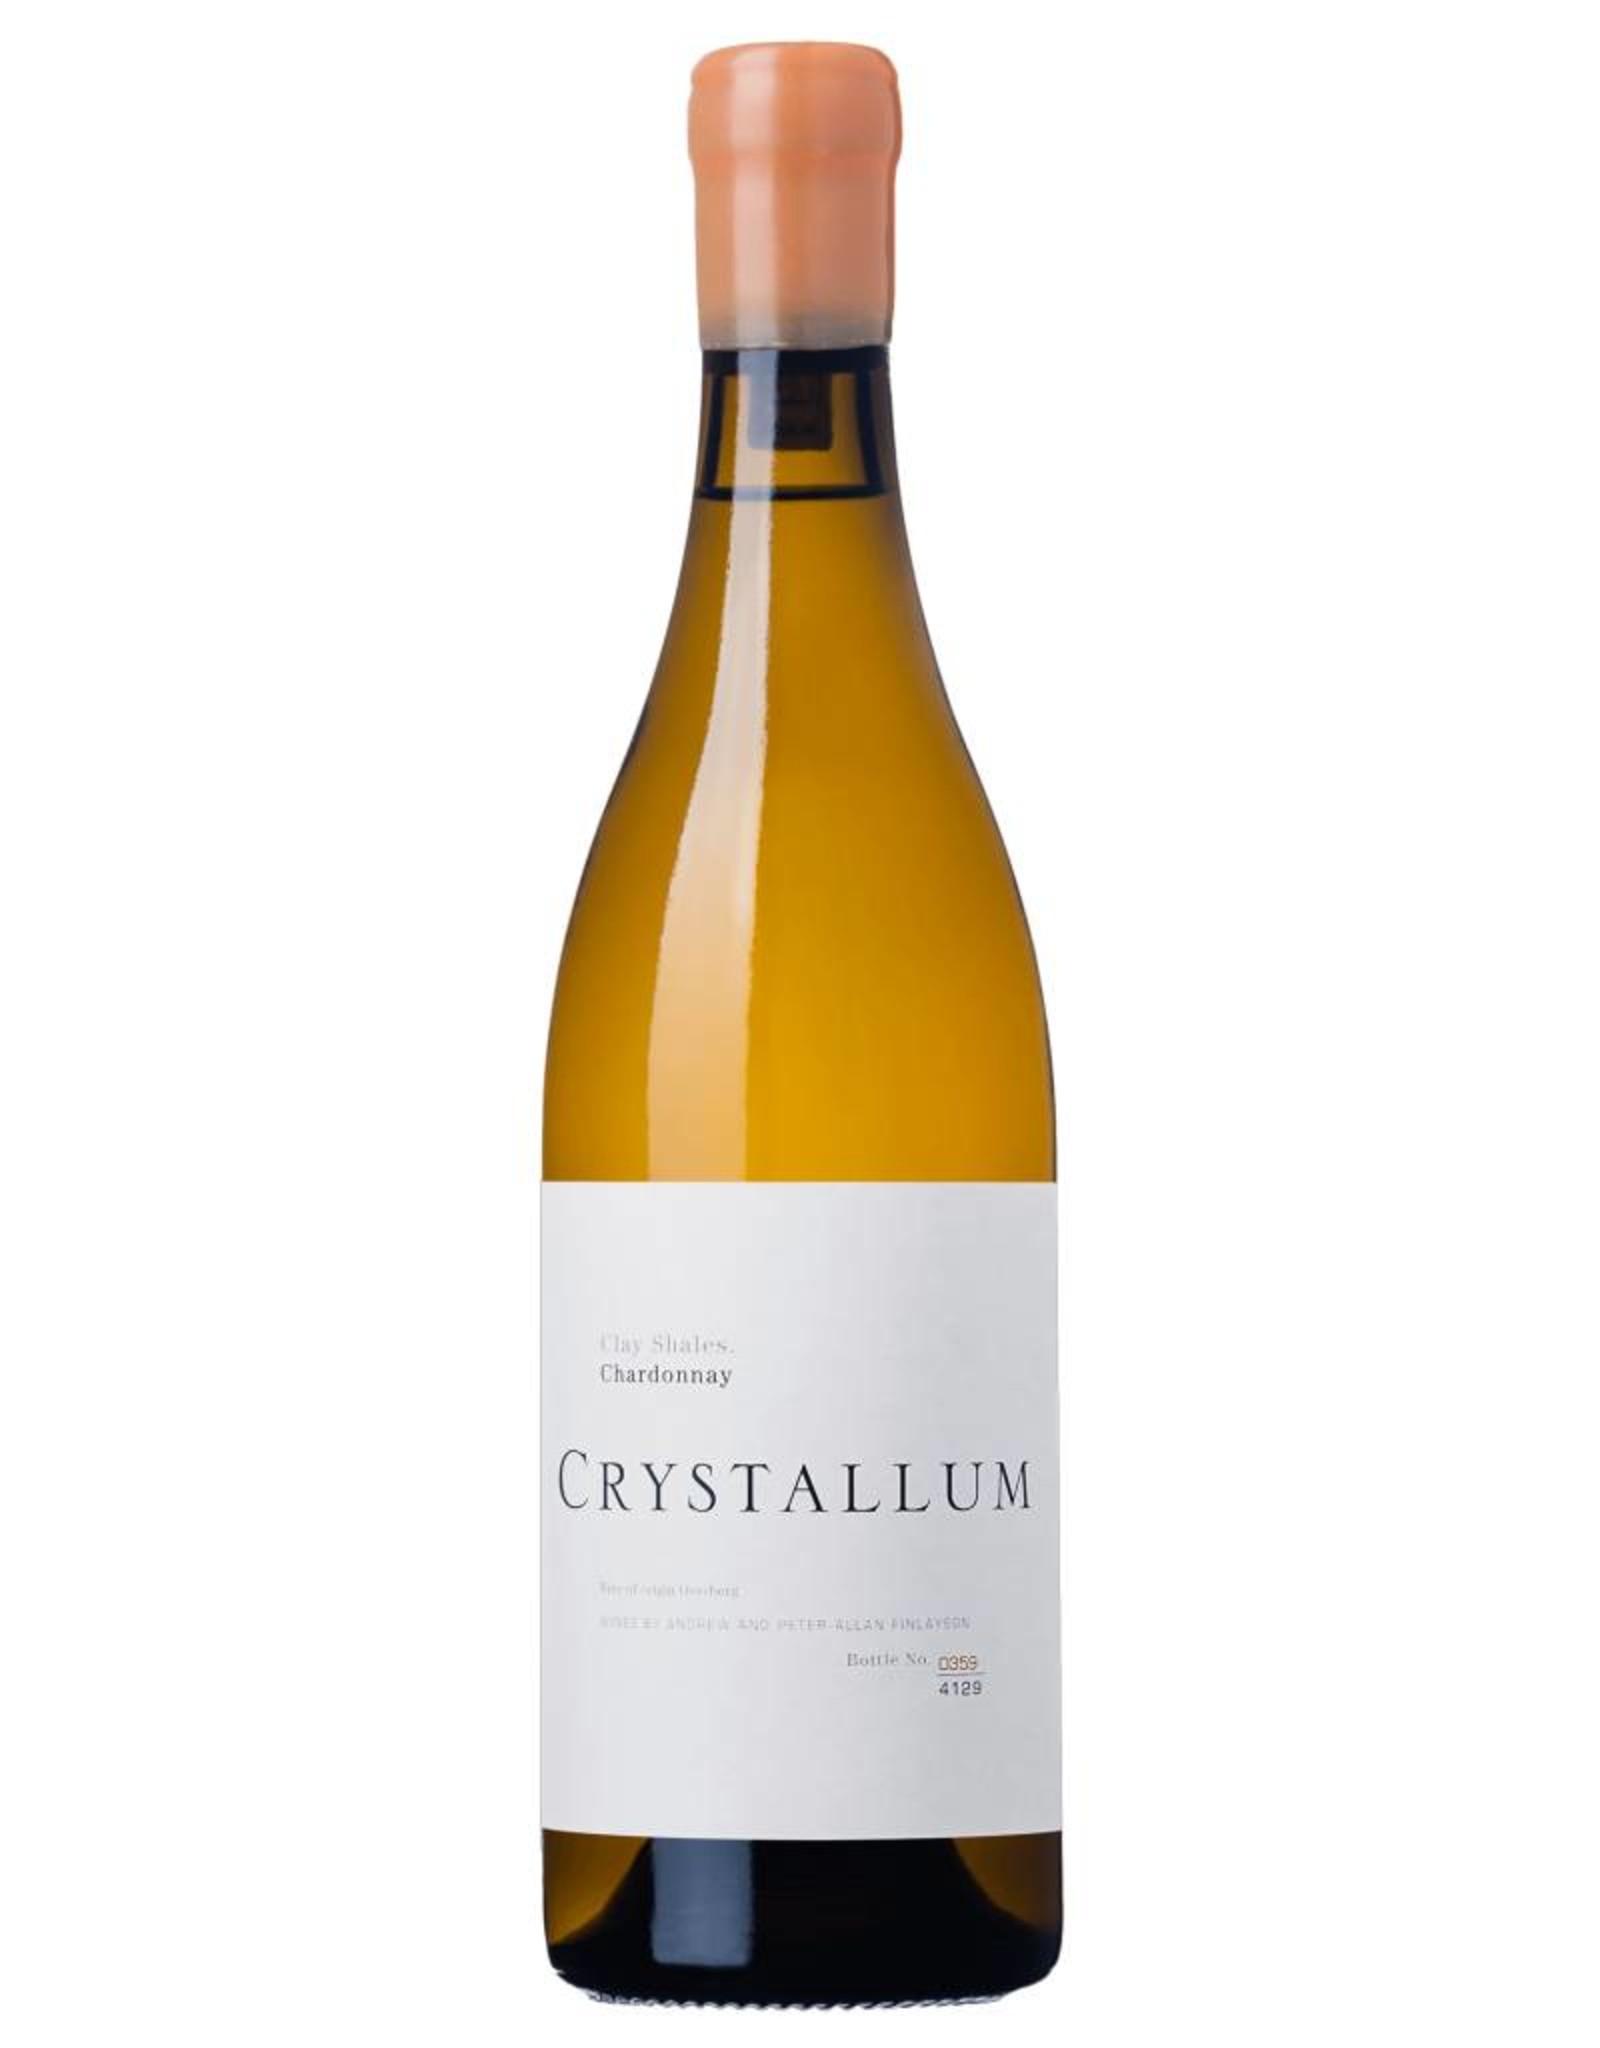 Crystallum - Clay Shales Chardonnay